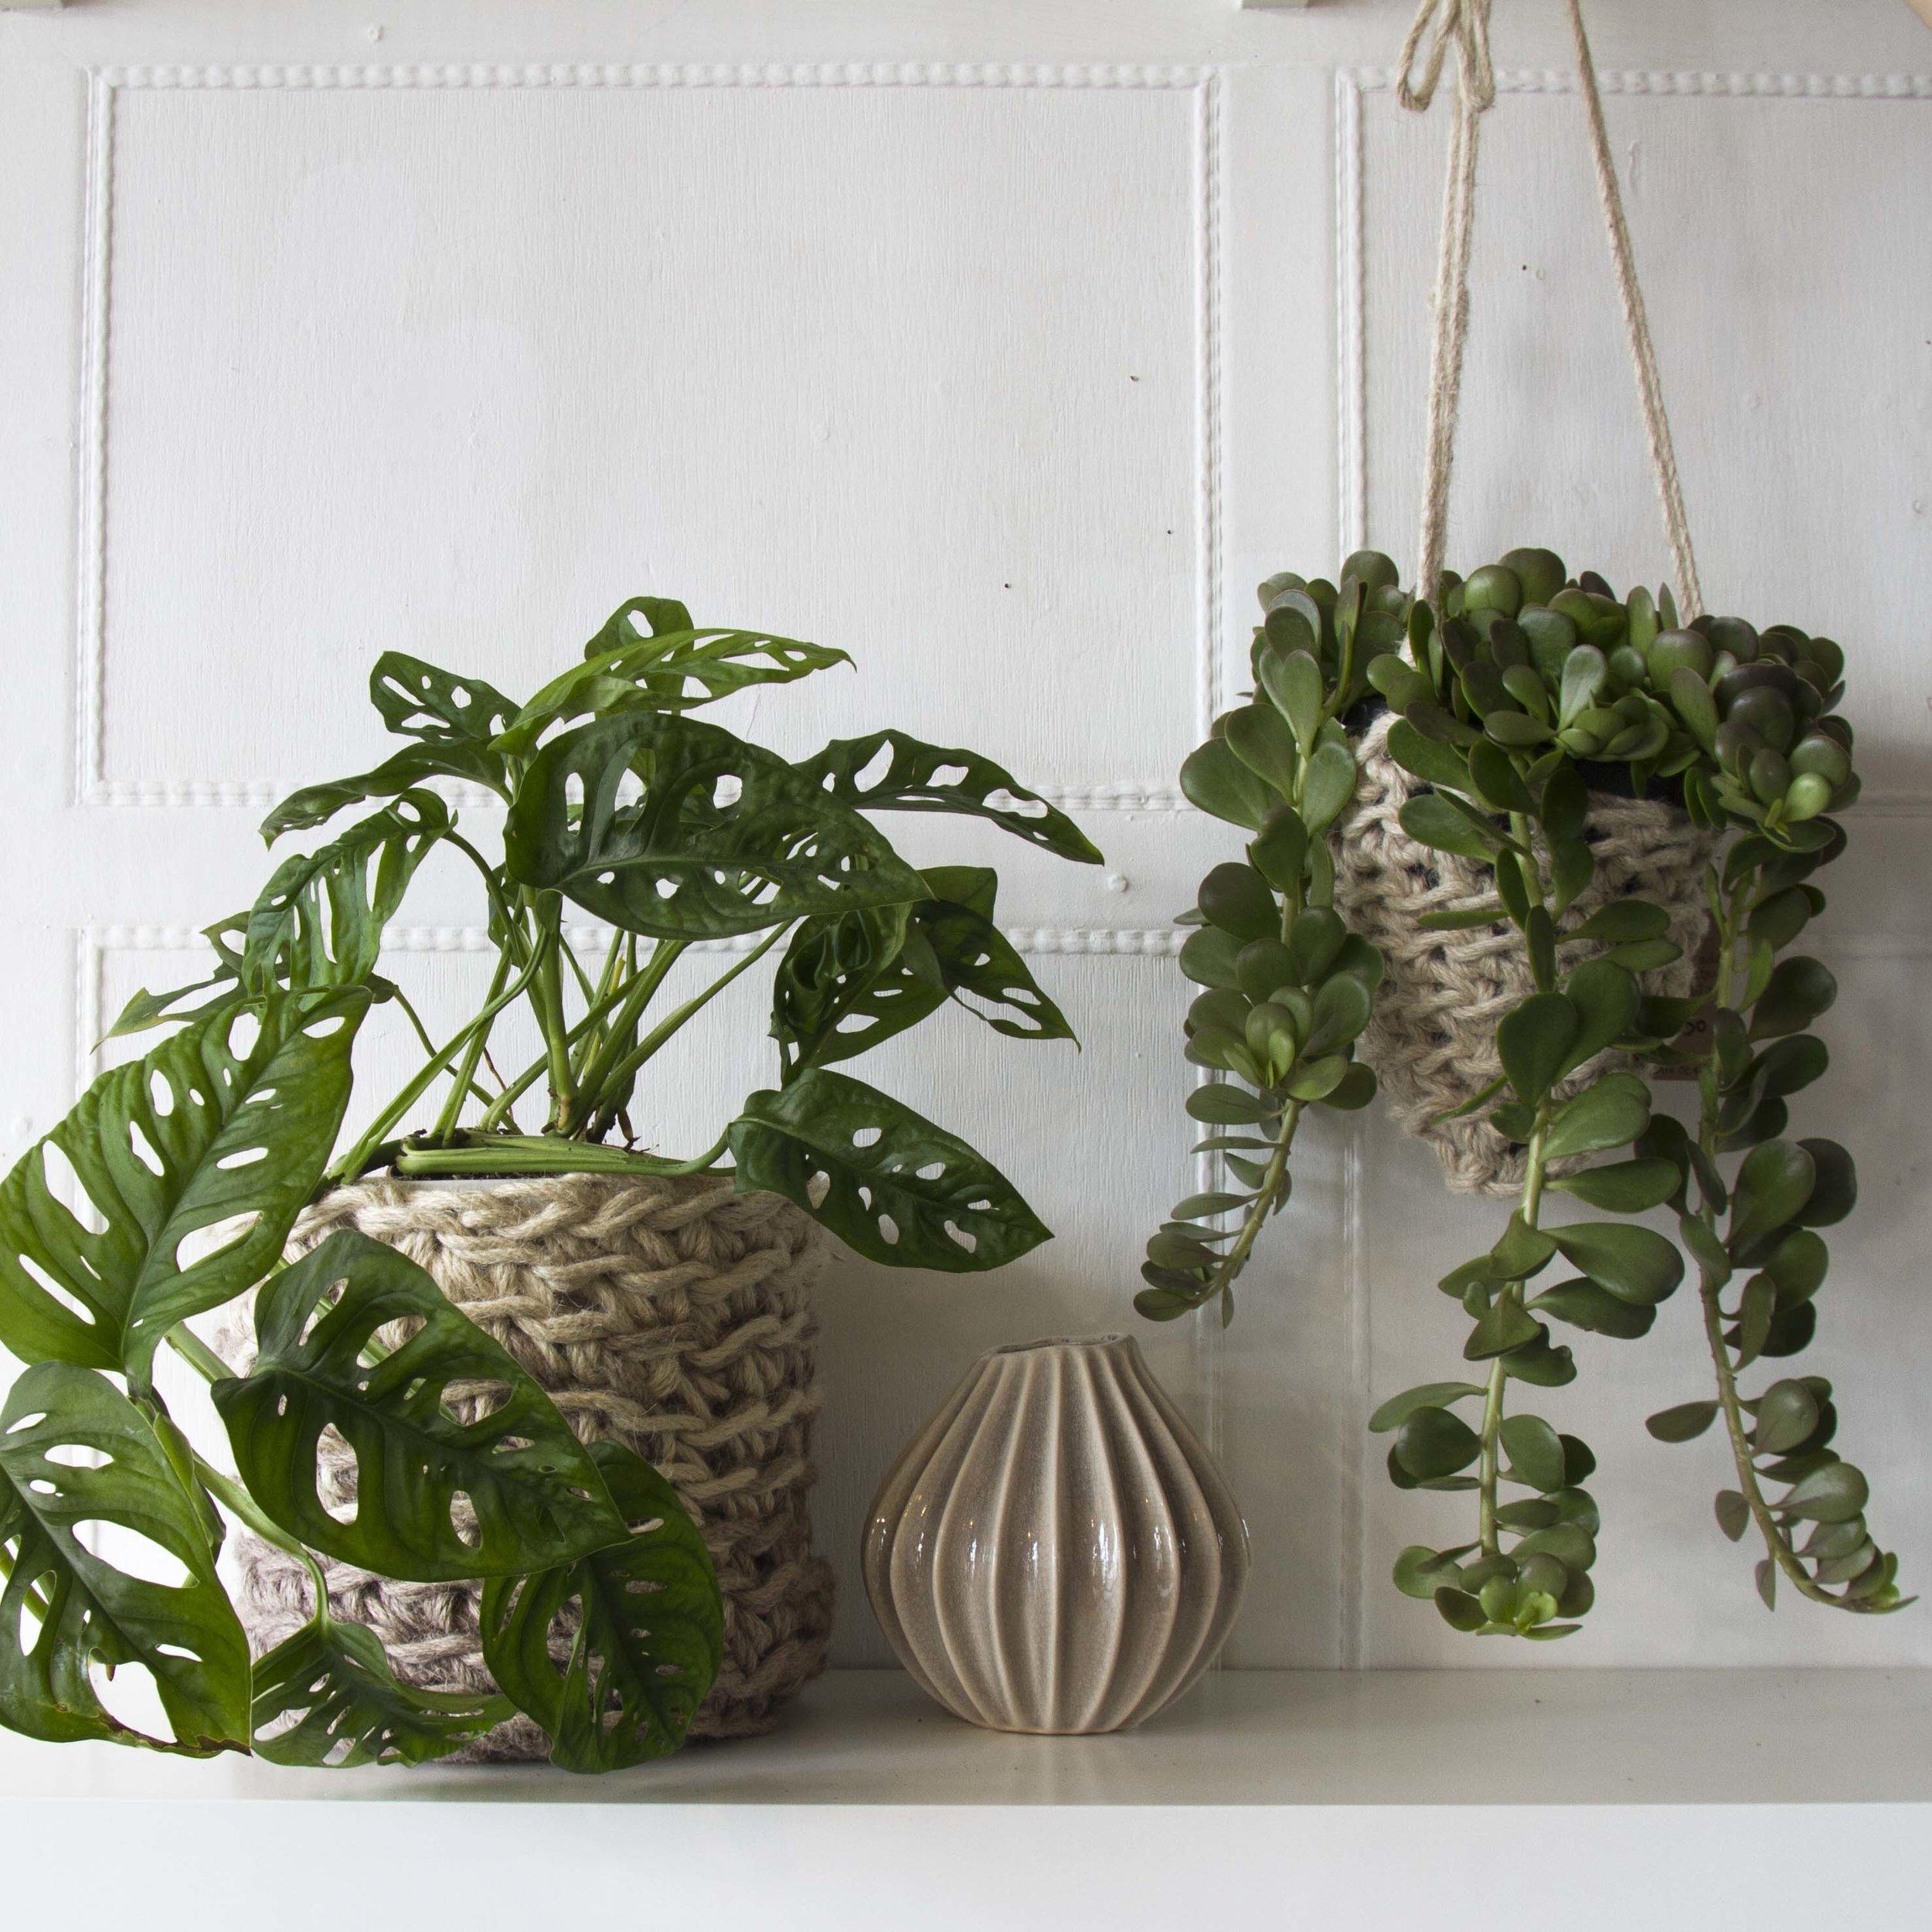 Cocoon&Me Crochet pots